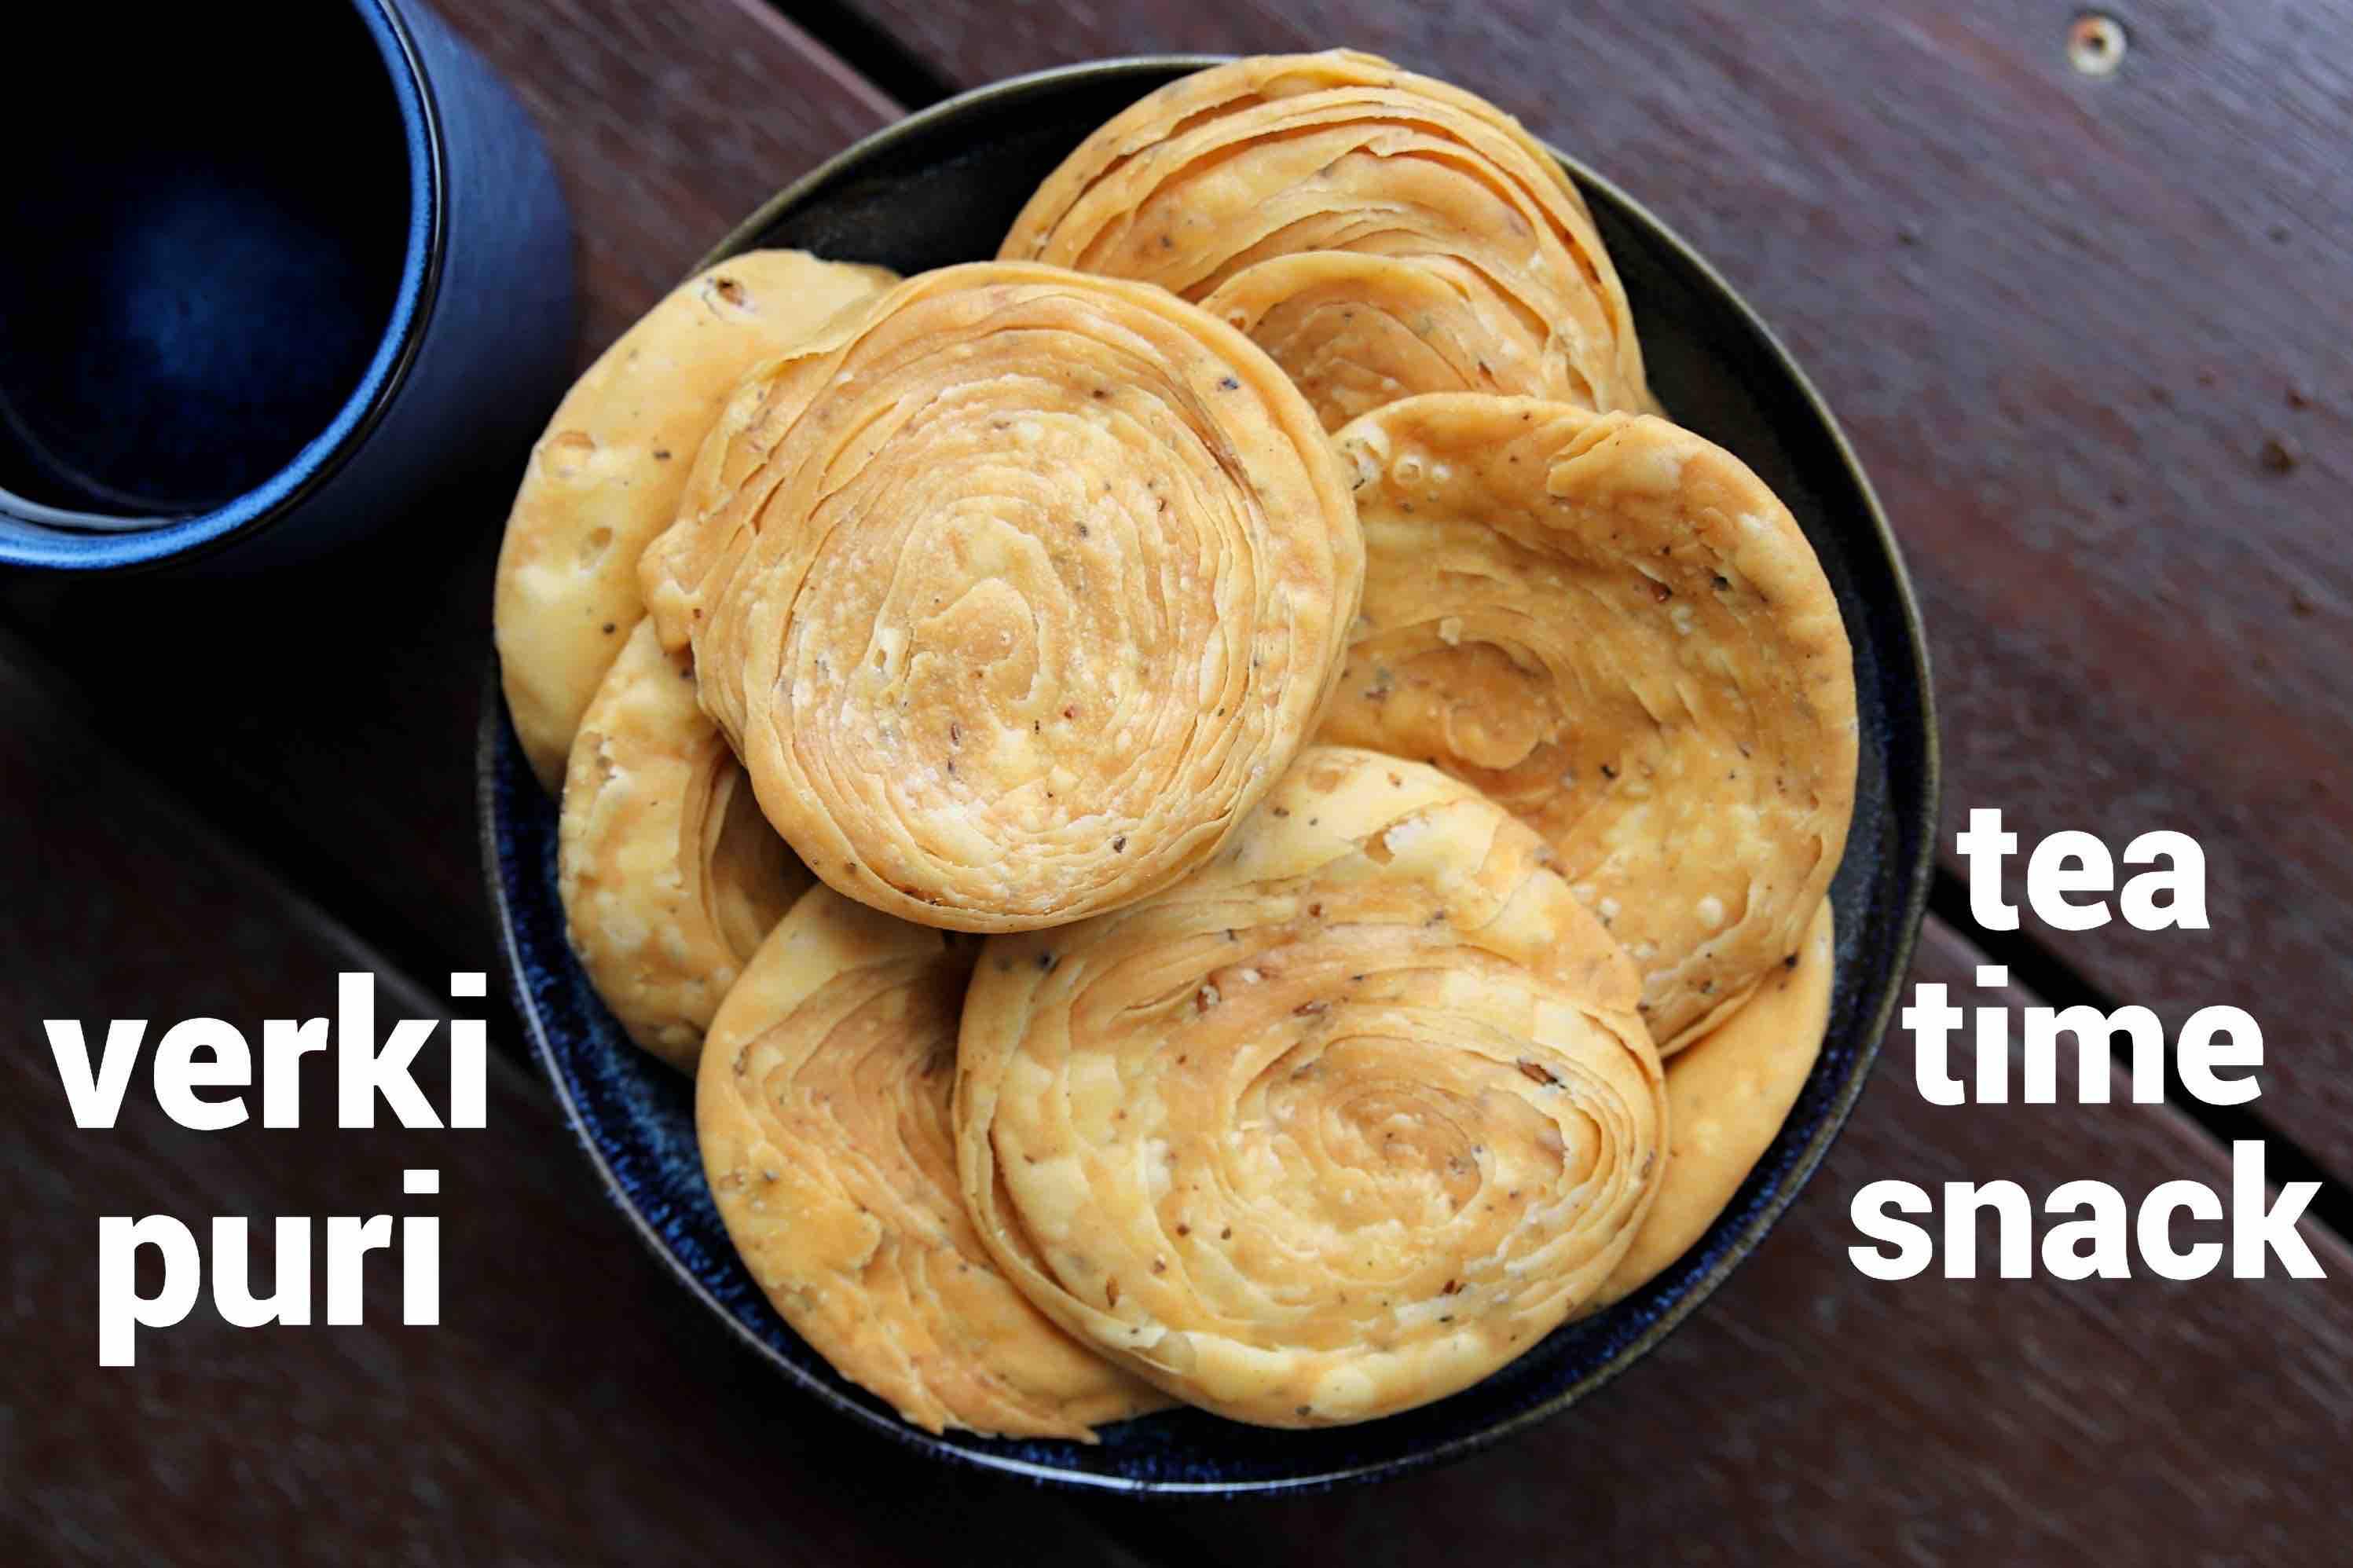 verki puri recipe | how to make crispy varki puri | verki snack